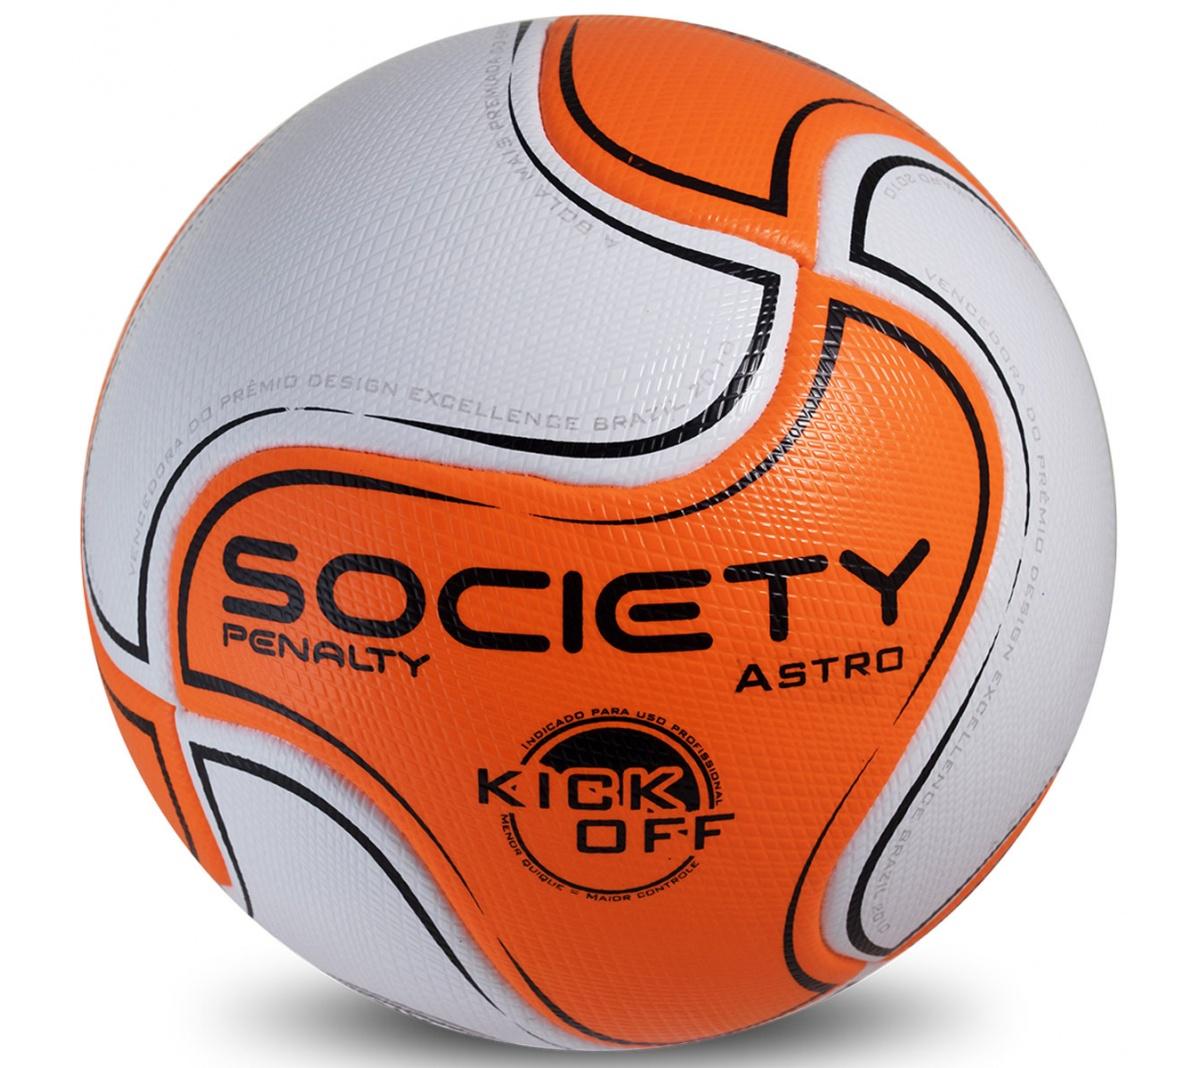 87767ea1b6 Bola Penalty Grama Sintética S11 Astro KICK OFF - Mundo do Futebol